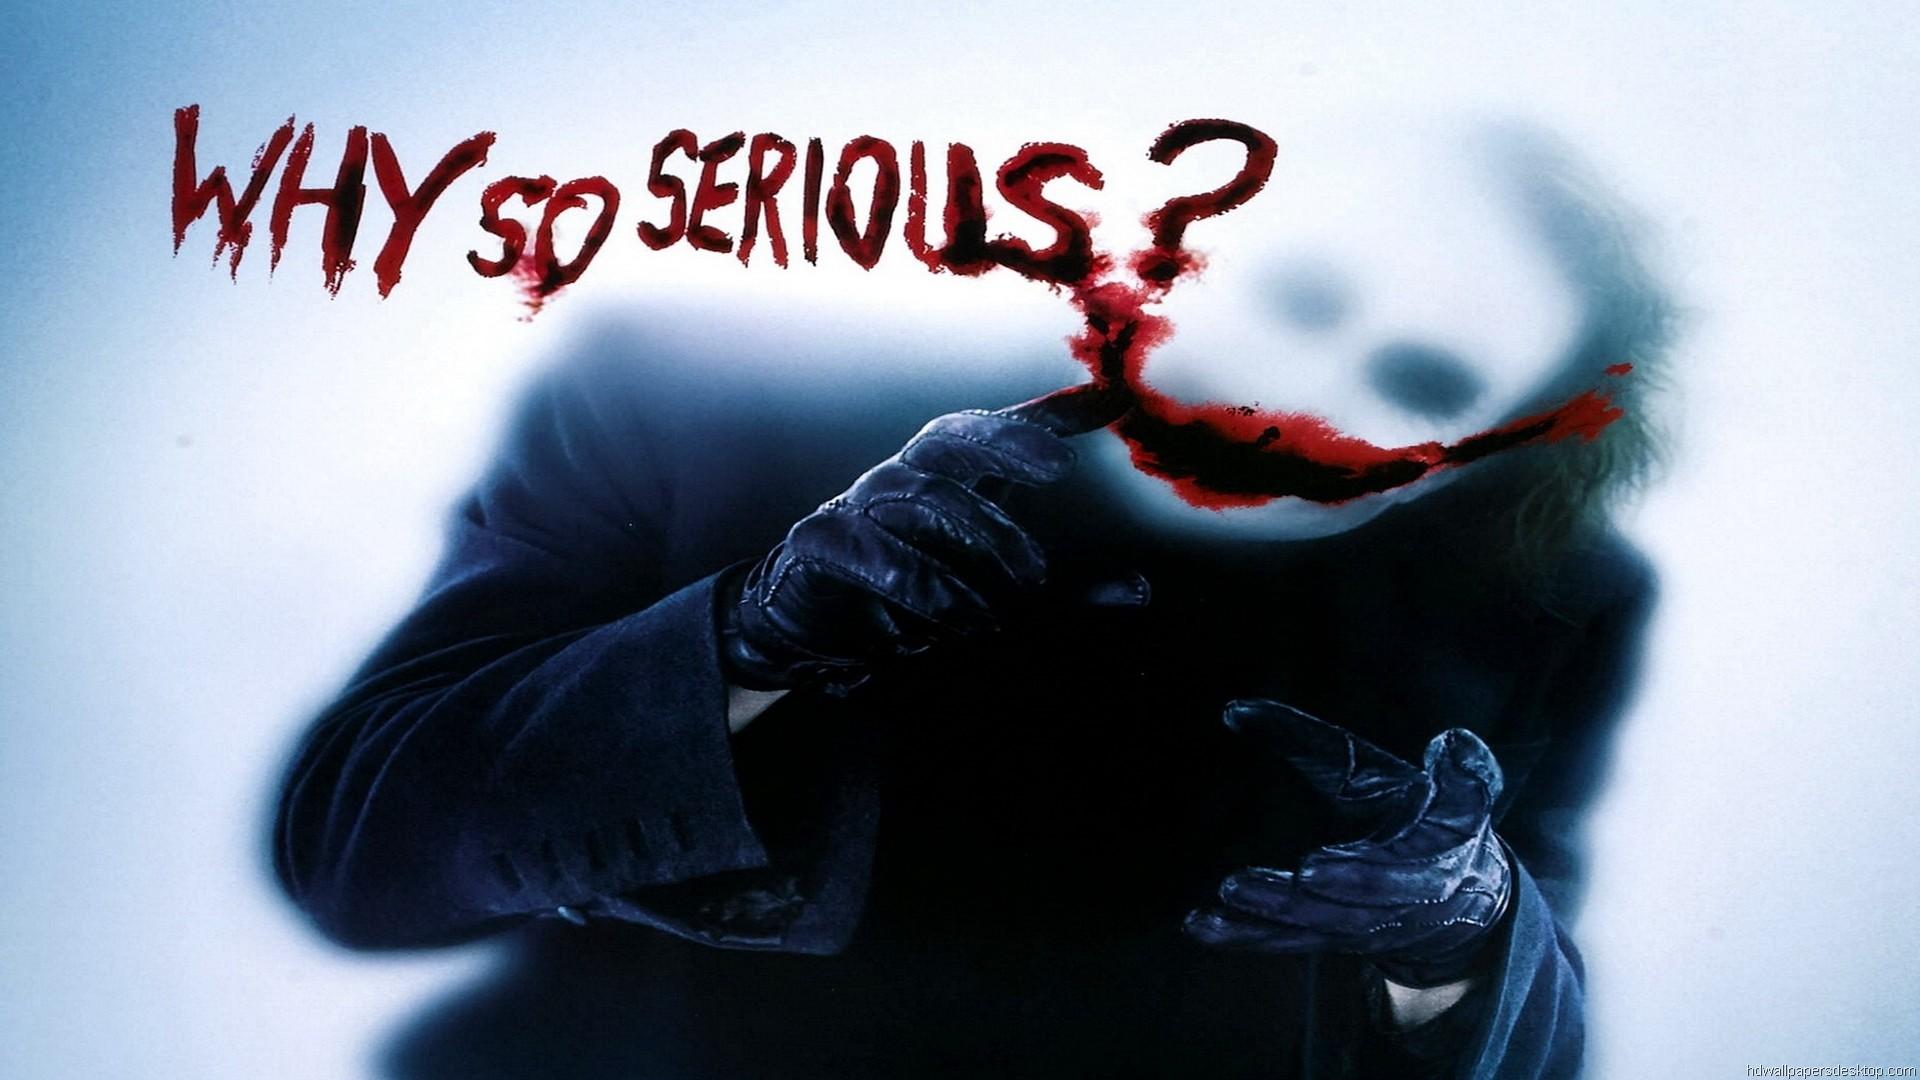 Joker Hd Wallpapers 1080p Joker Why So Serious 64000